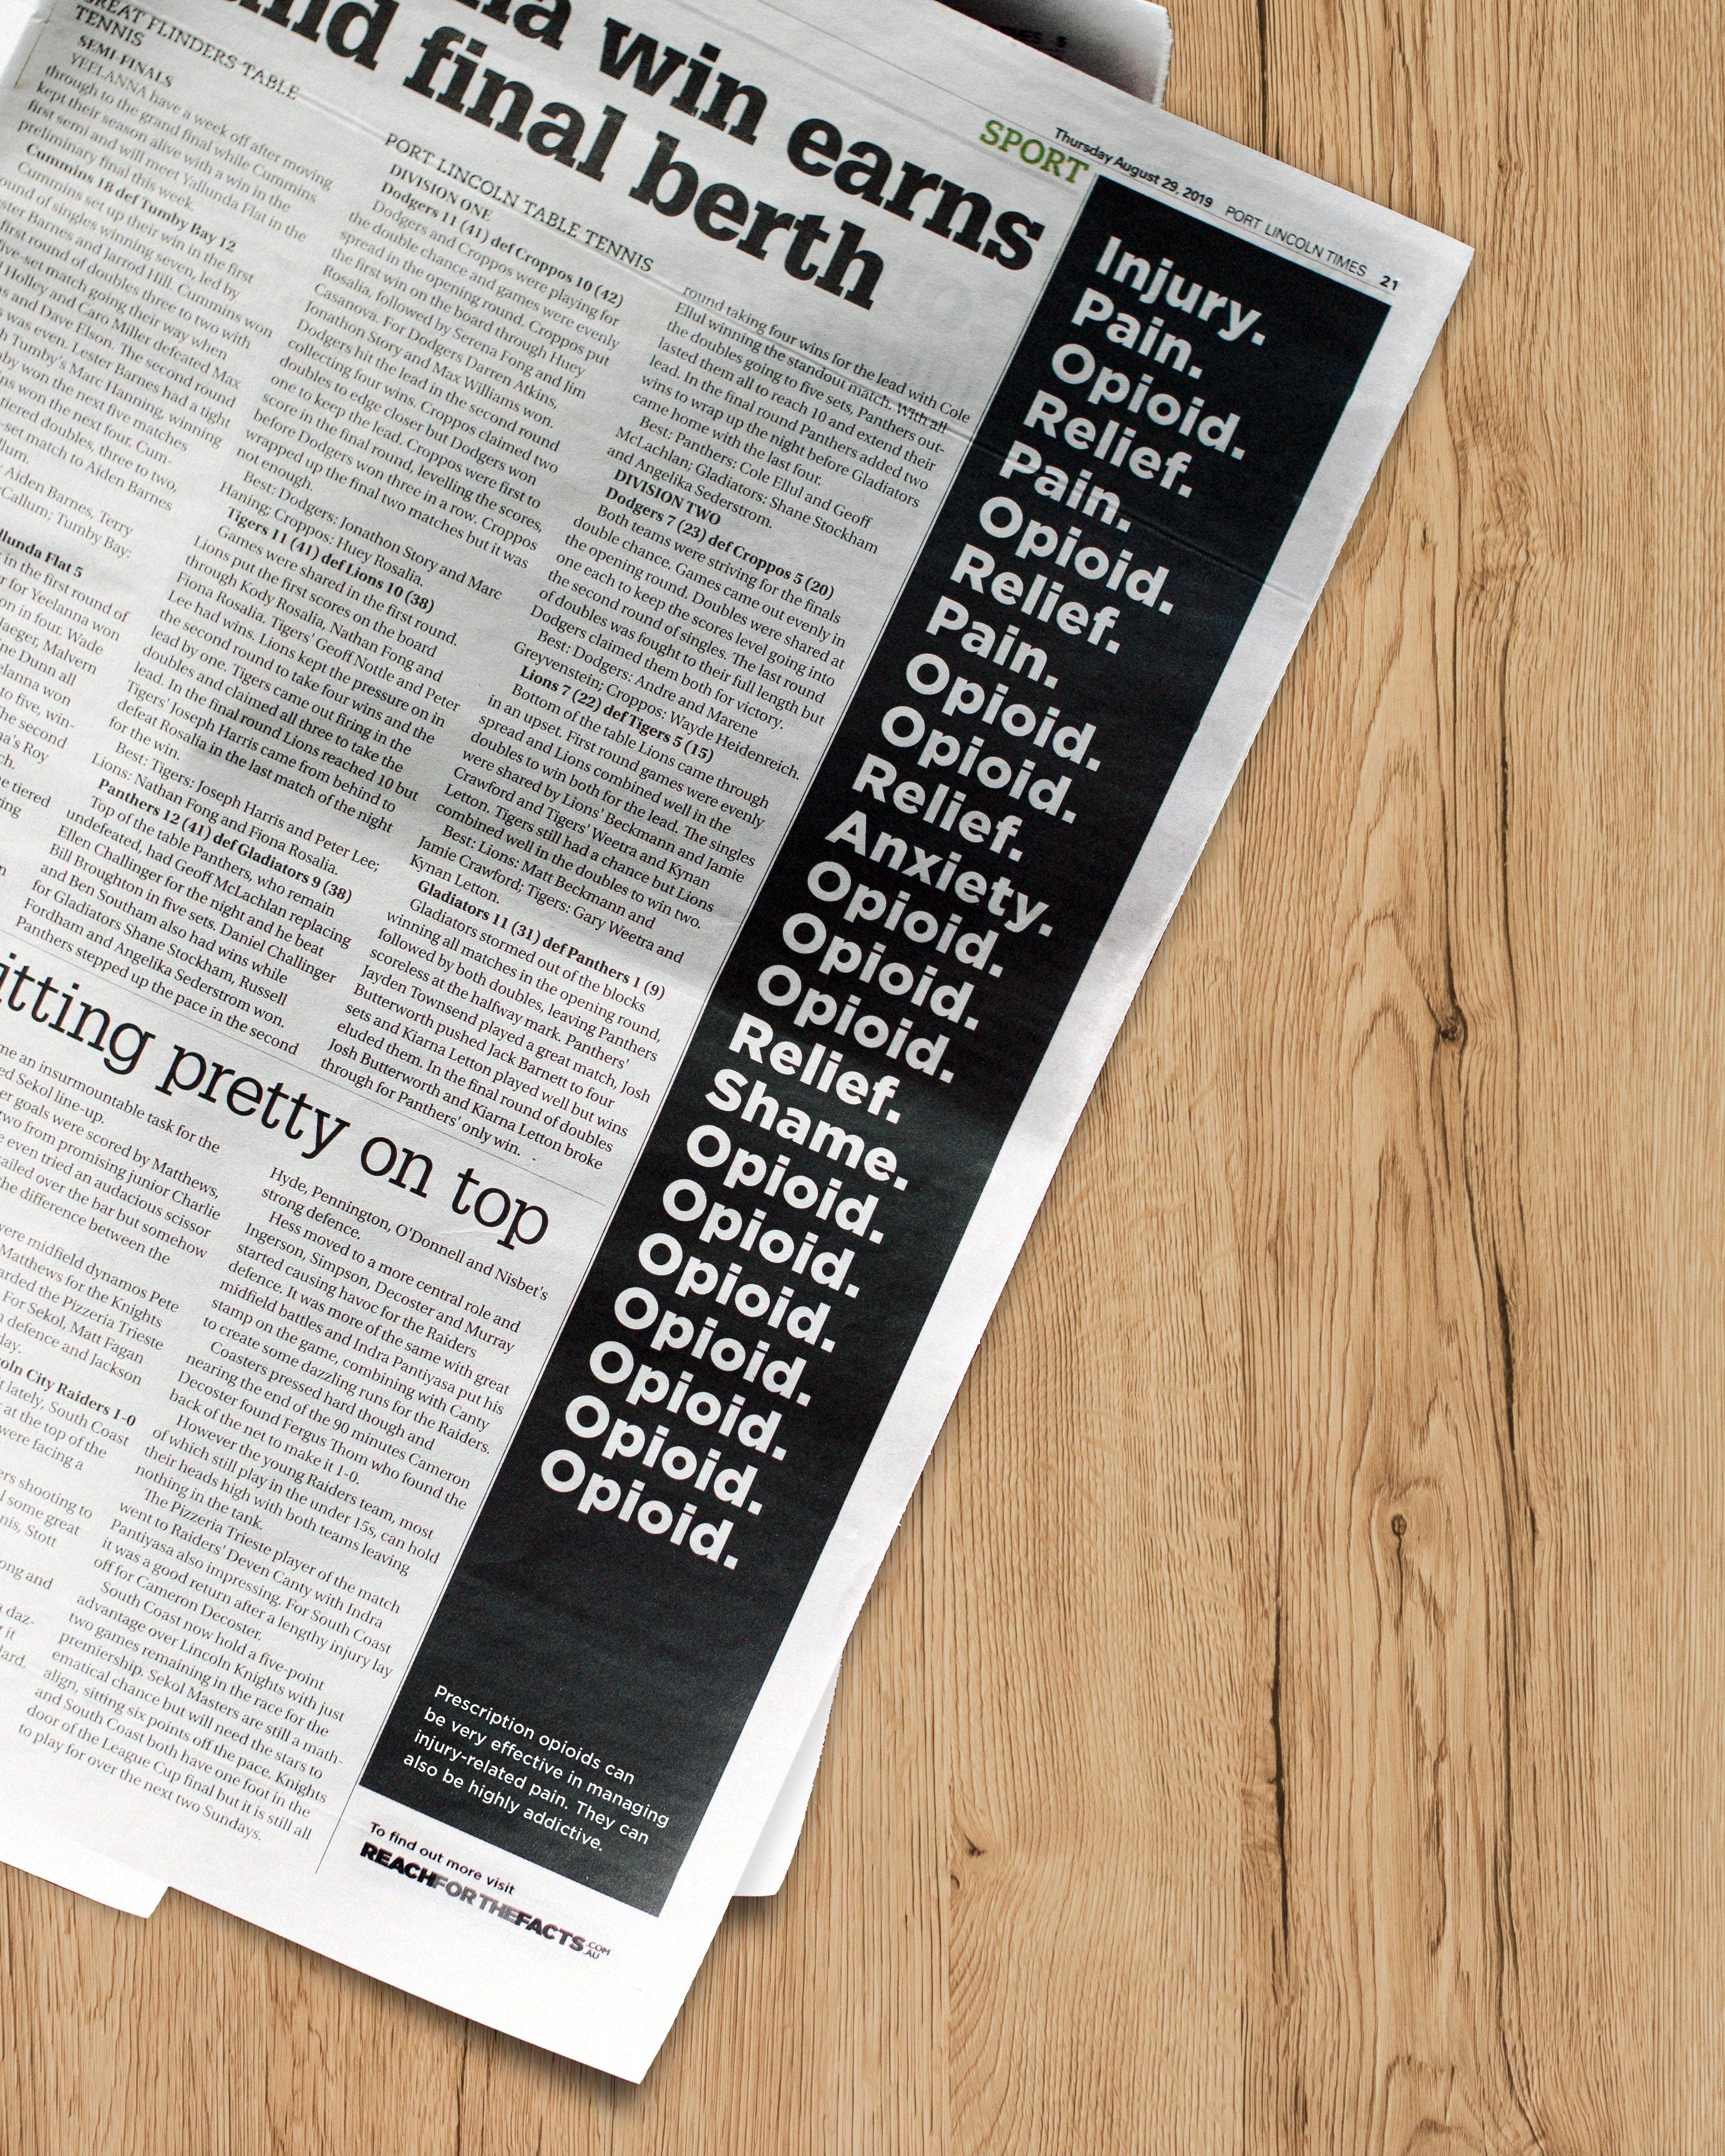 Opioids in the Paper2